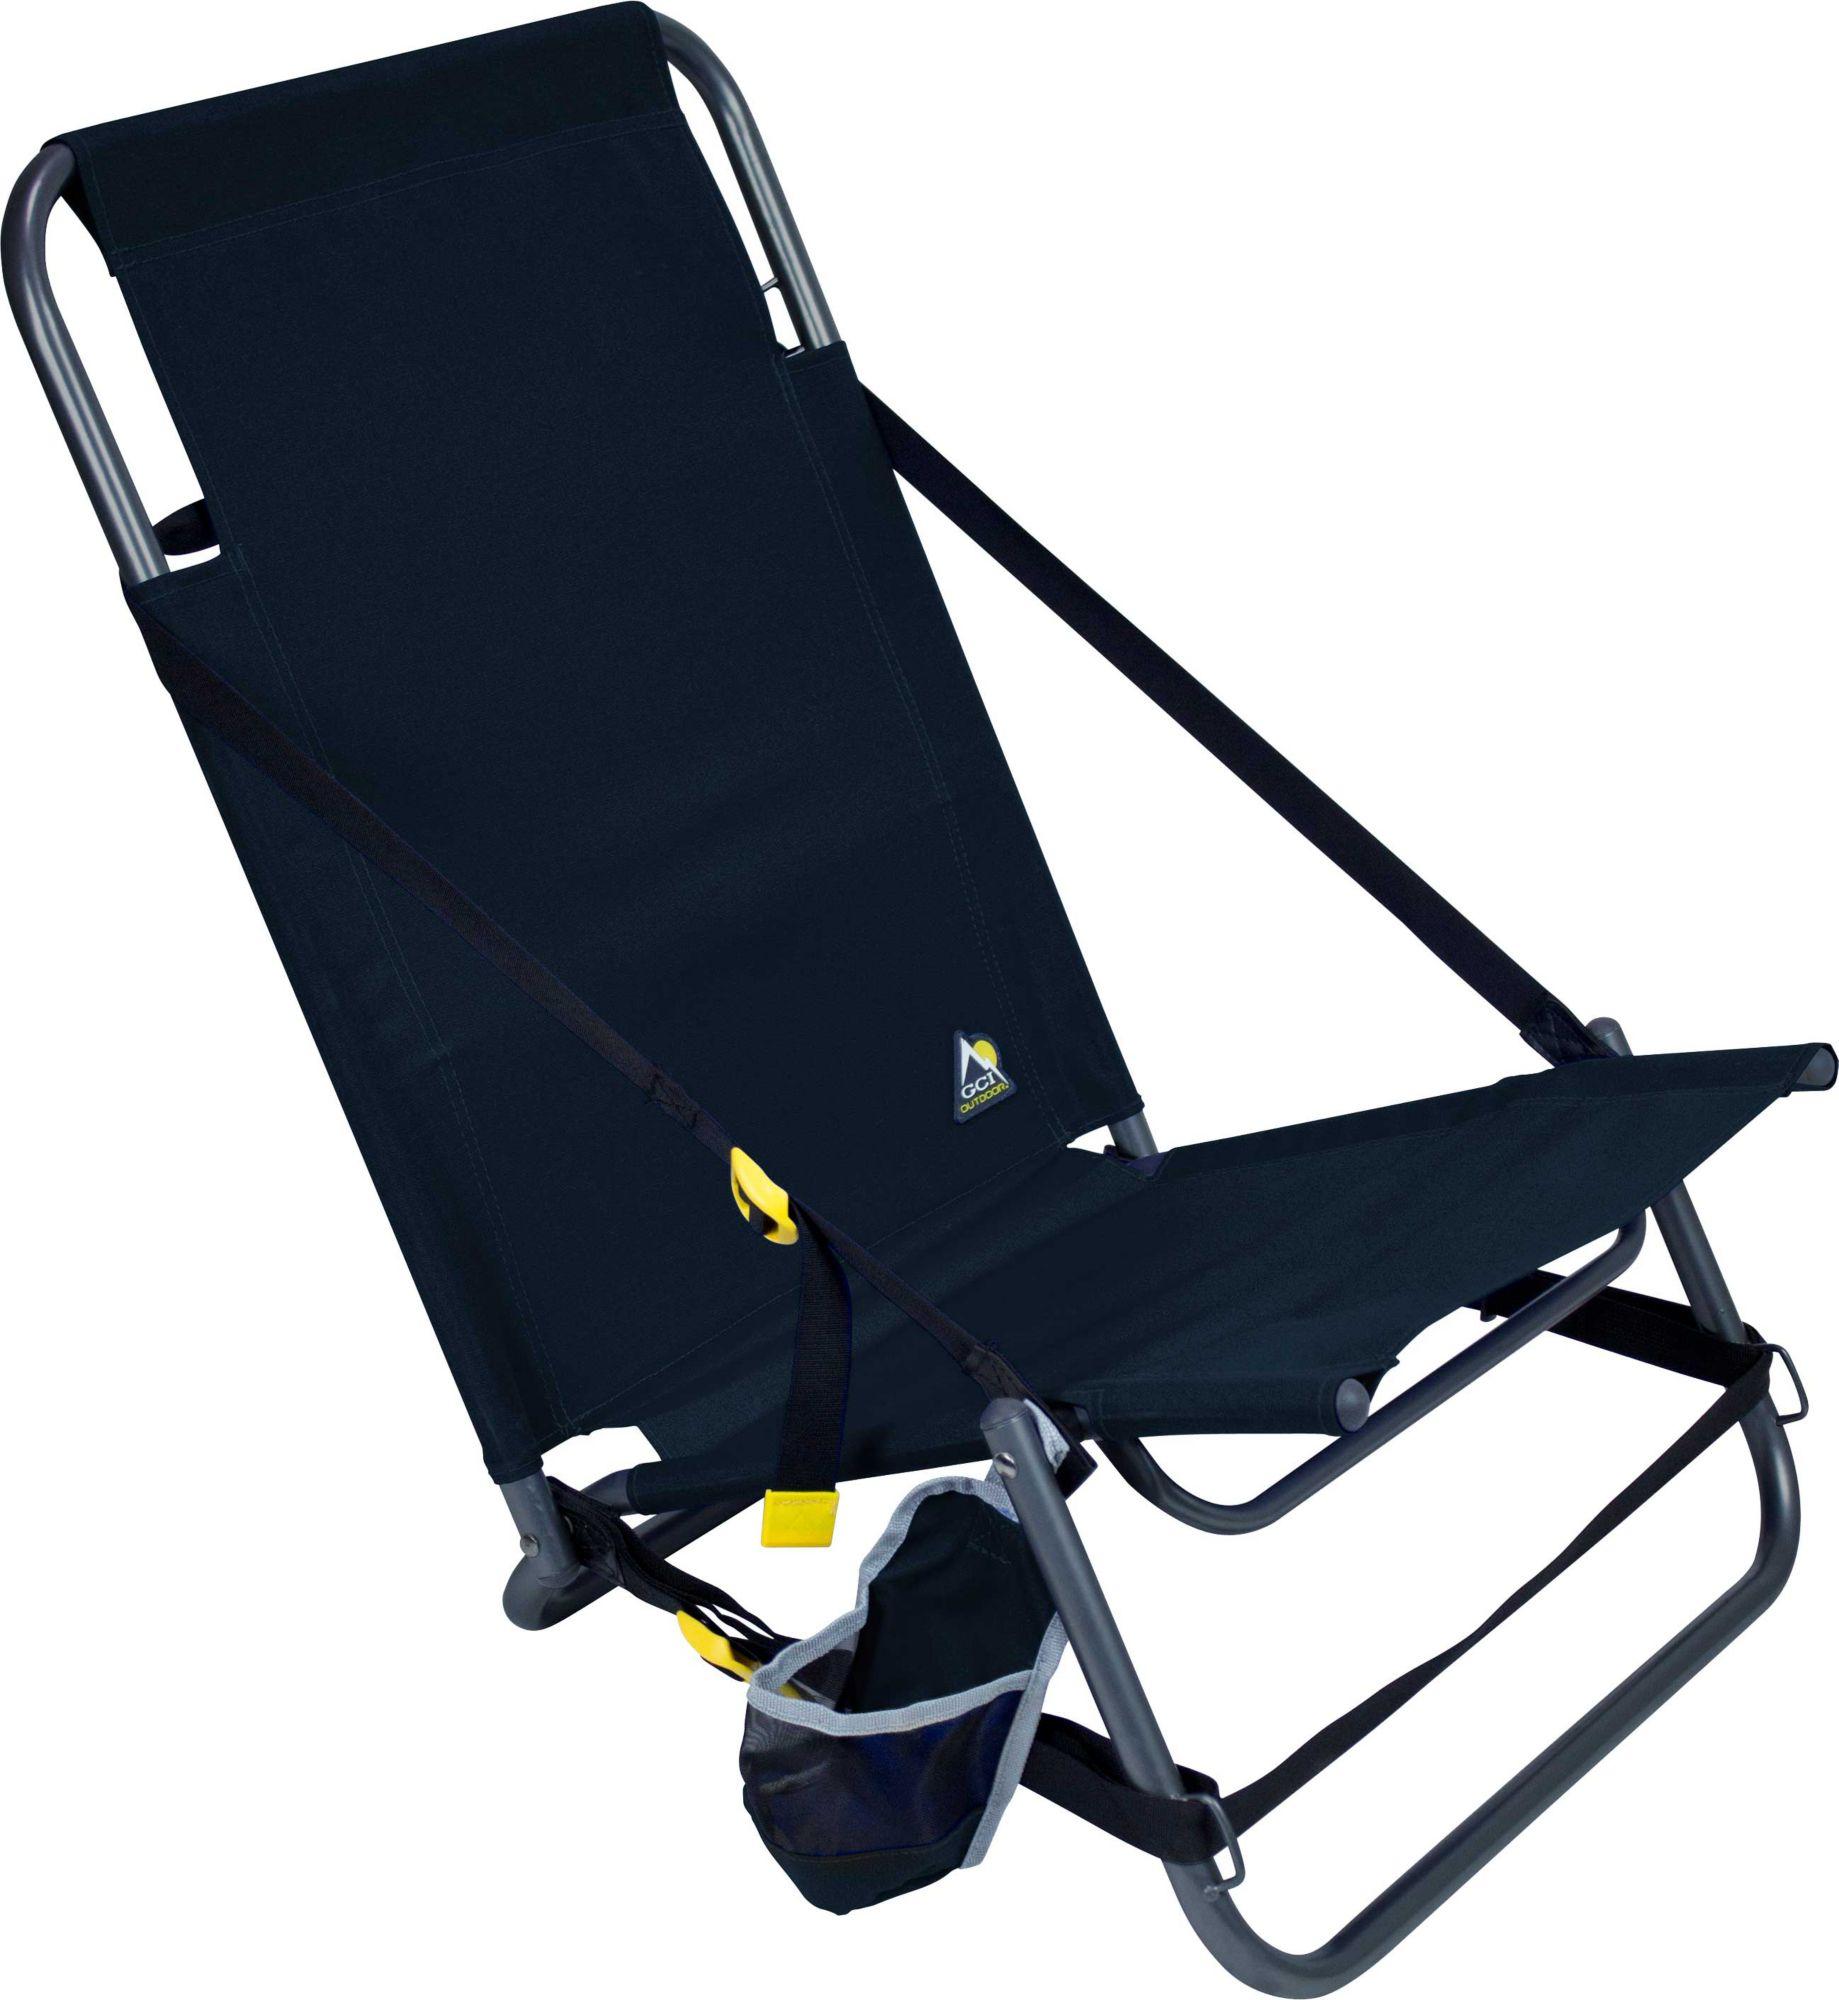 GCI Outdoor Everywhere Chair  sc 1 st  DICKu0027S Sporting Goods & GCI Outdoor Everywhere Chair   DICKu0027S Sporting Goods